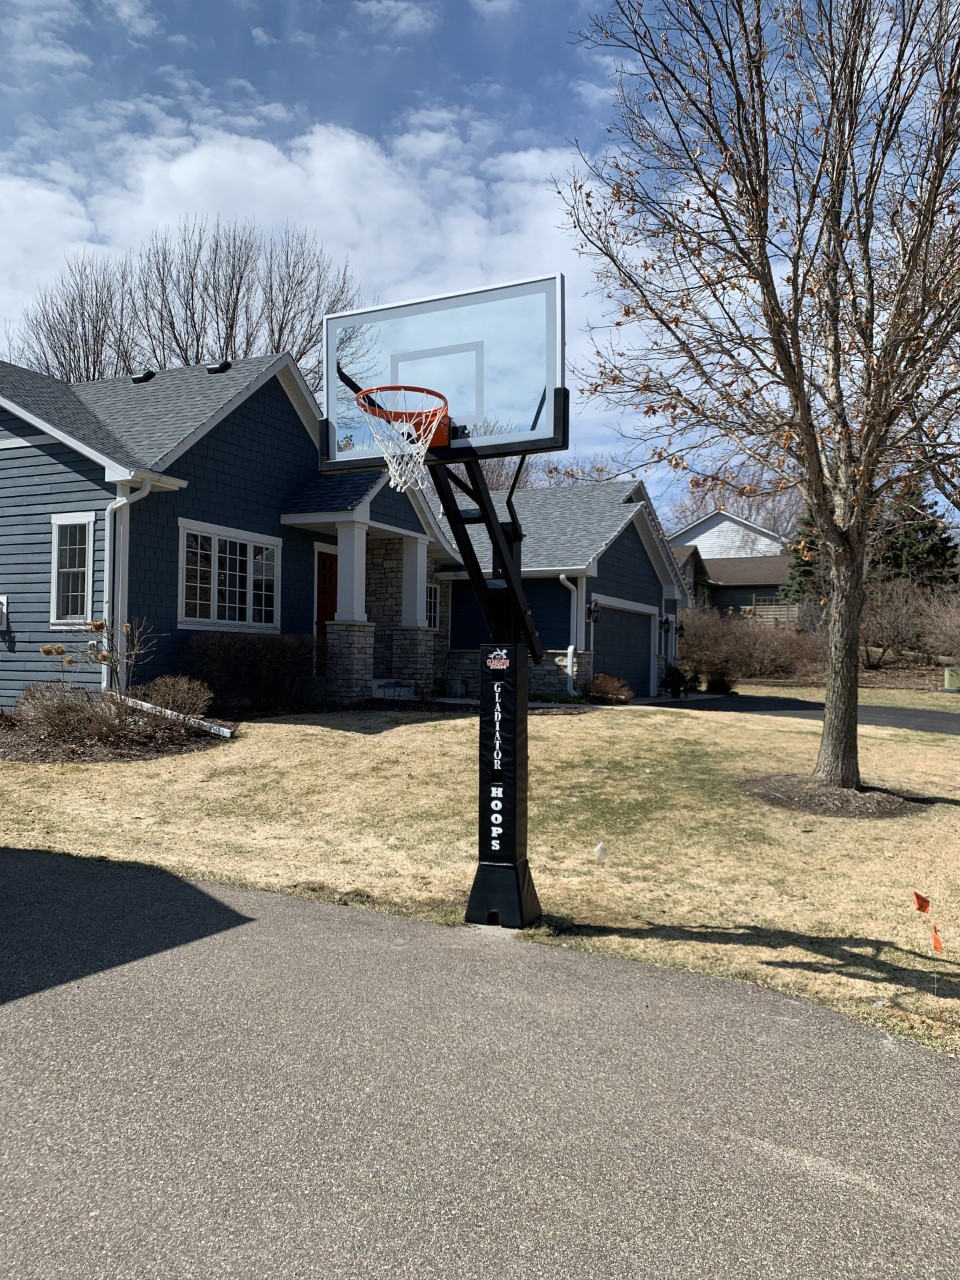 "Gladiator 60"" In-ground basketball hoop"